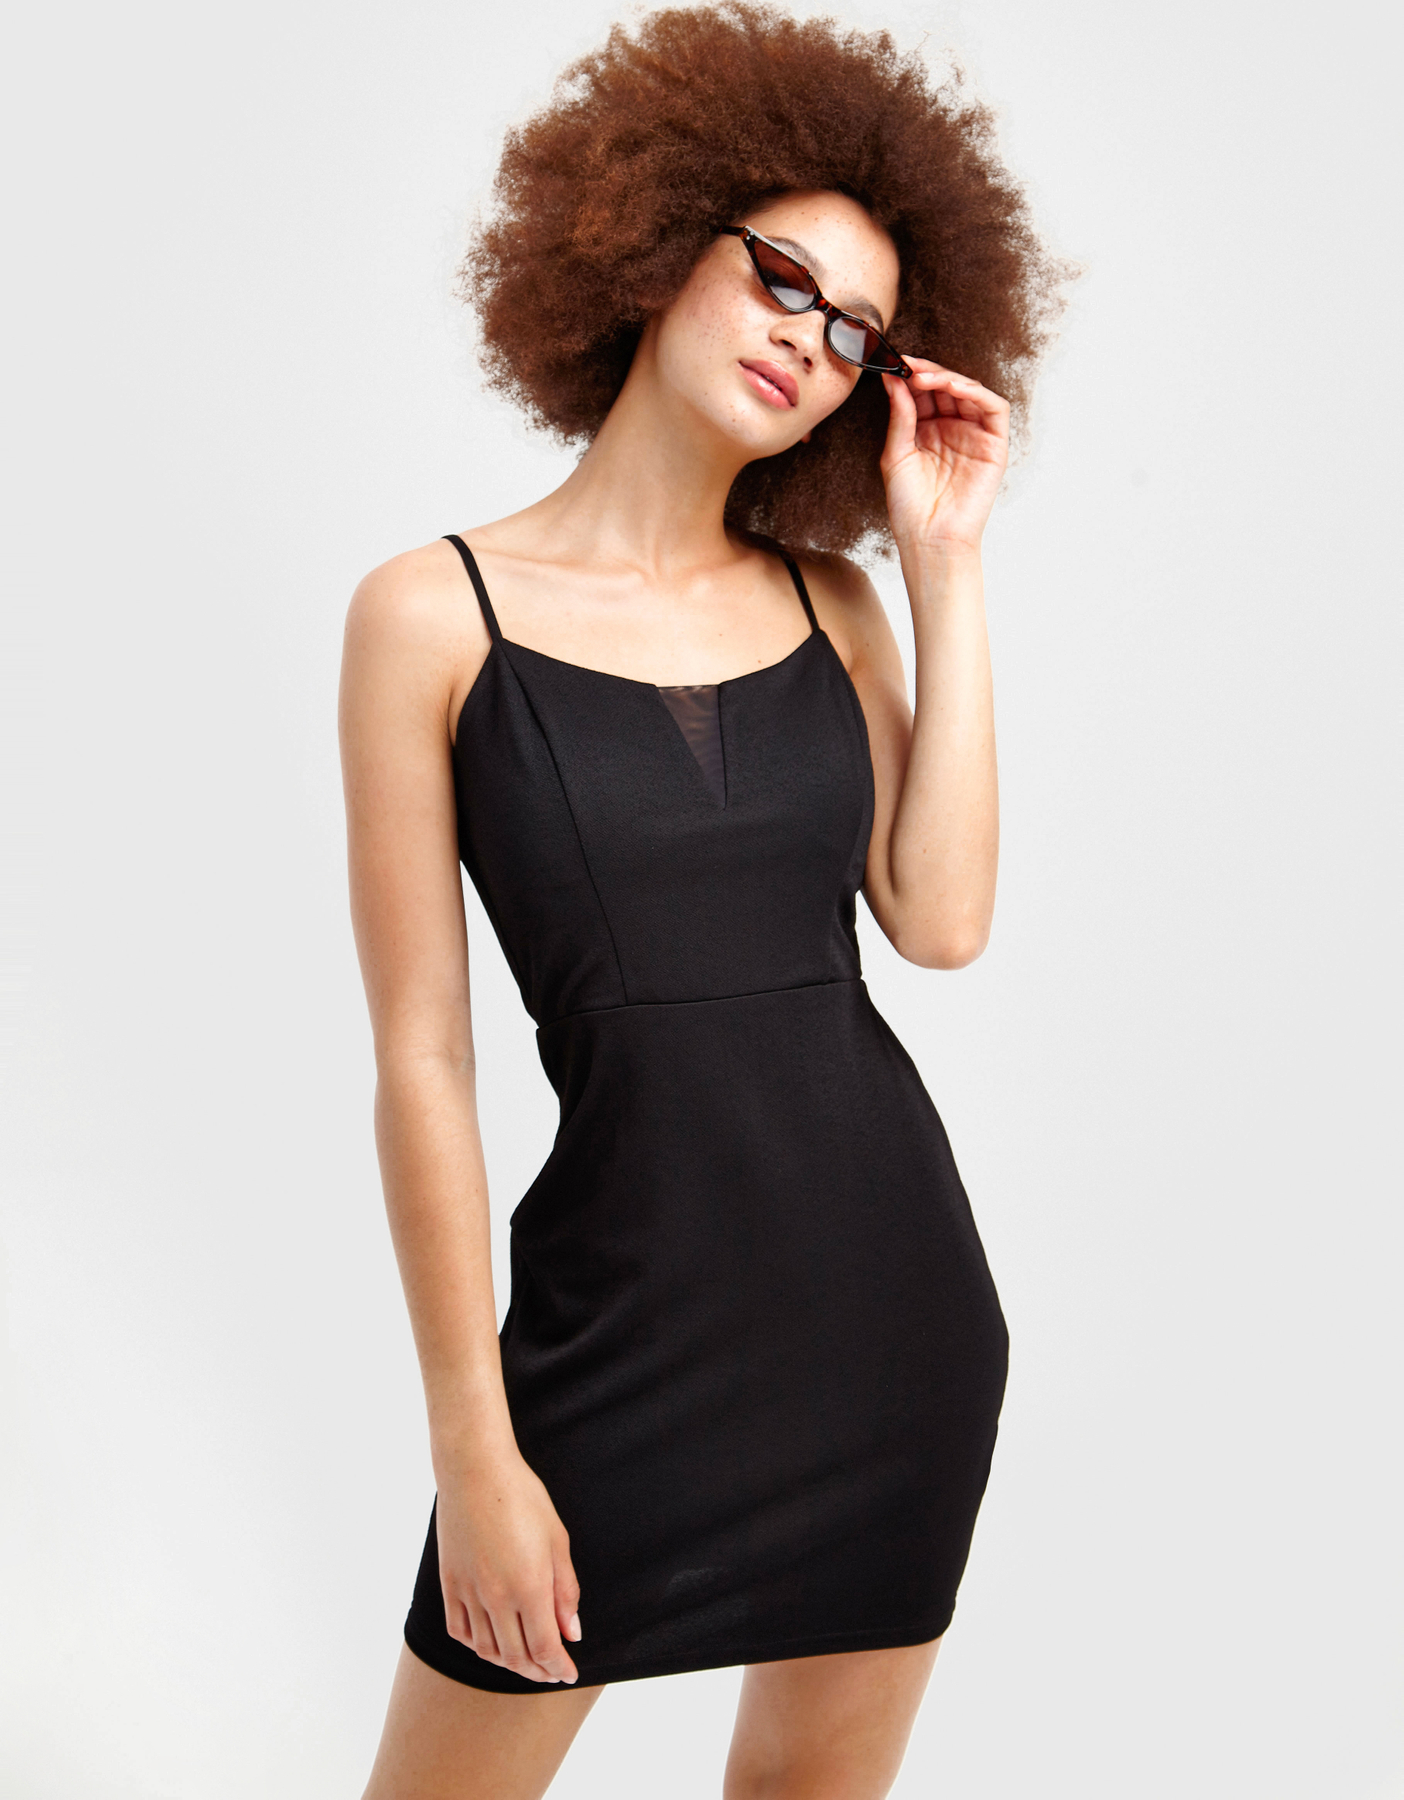 Schwarzes, figurbetontes Mini Kleid